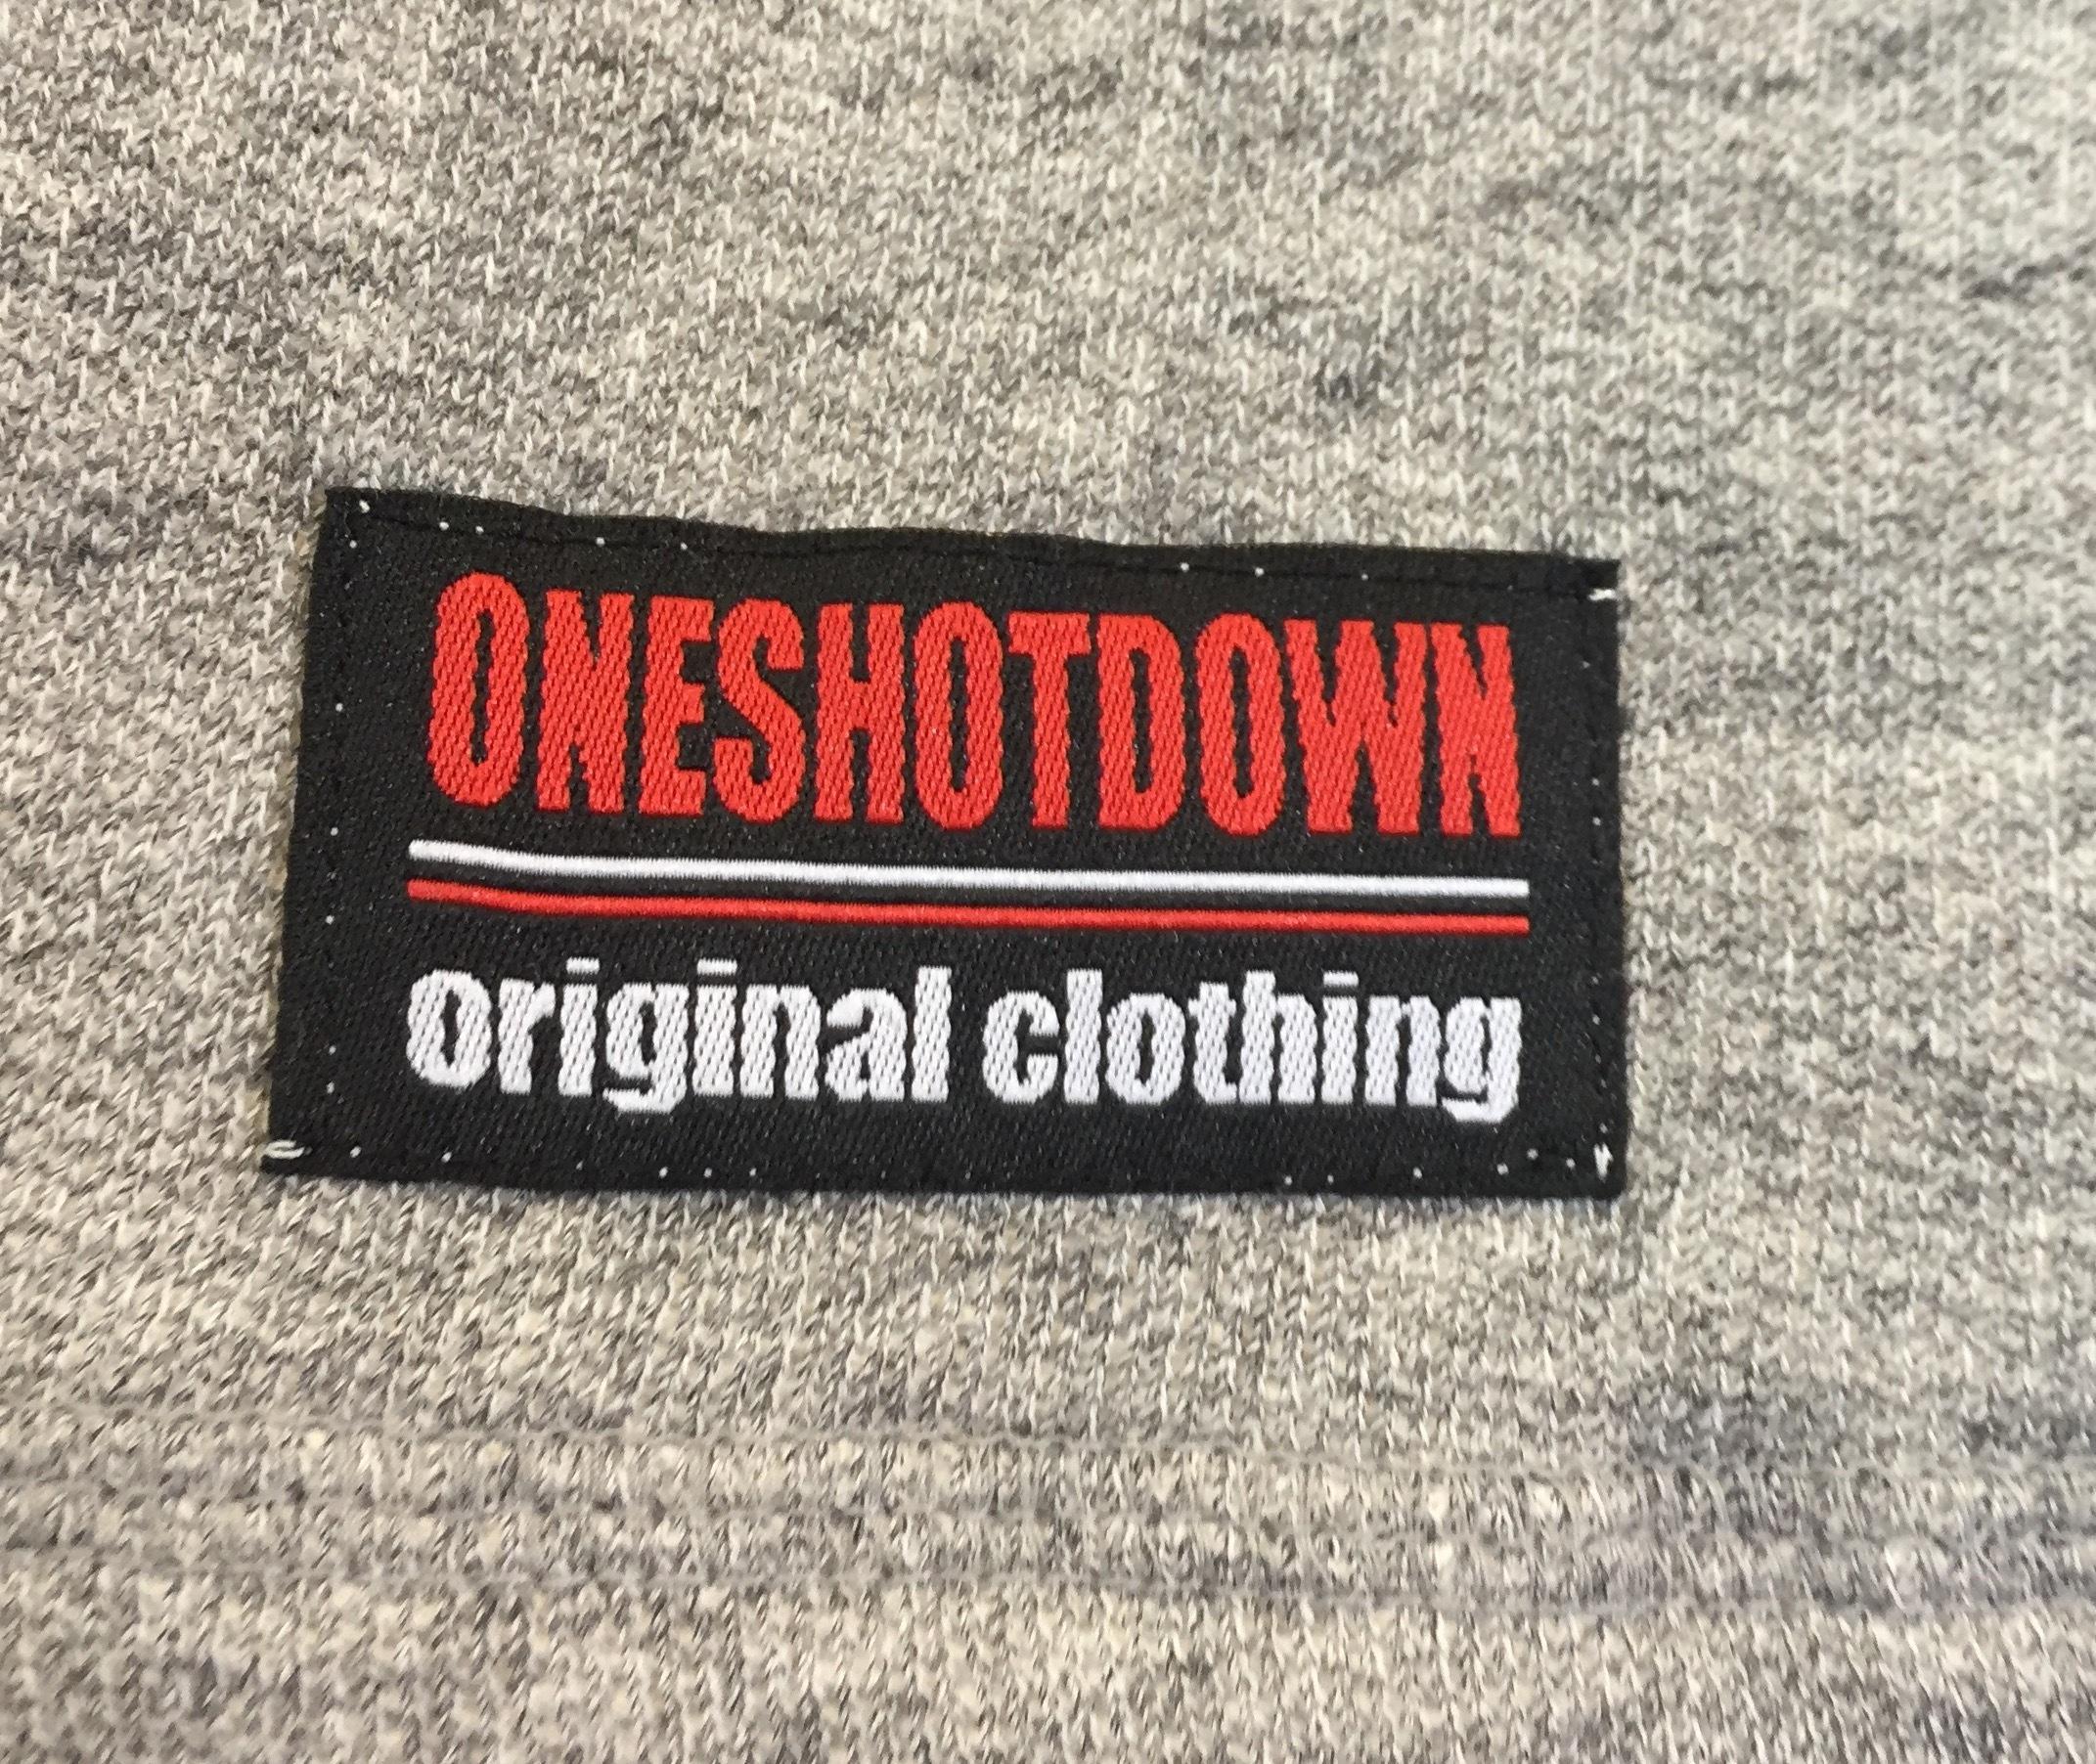 ONESHOTDOWN Xデザイン フレンチテリー ハーフパンツ - 画像5